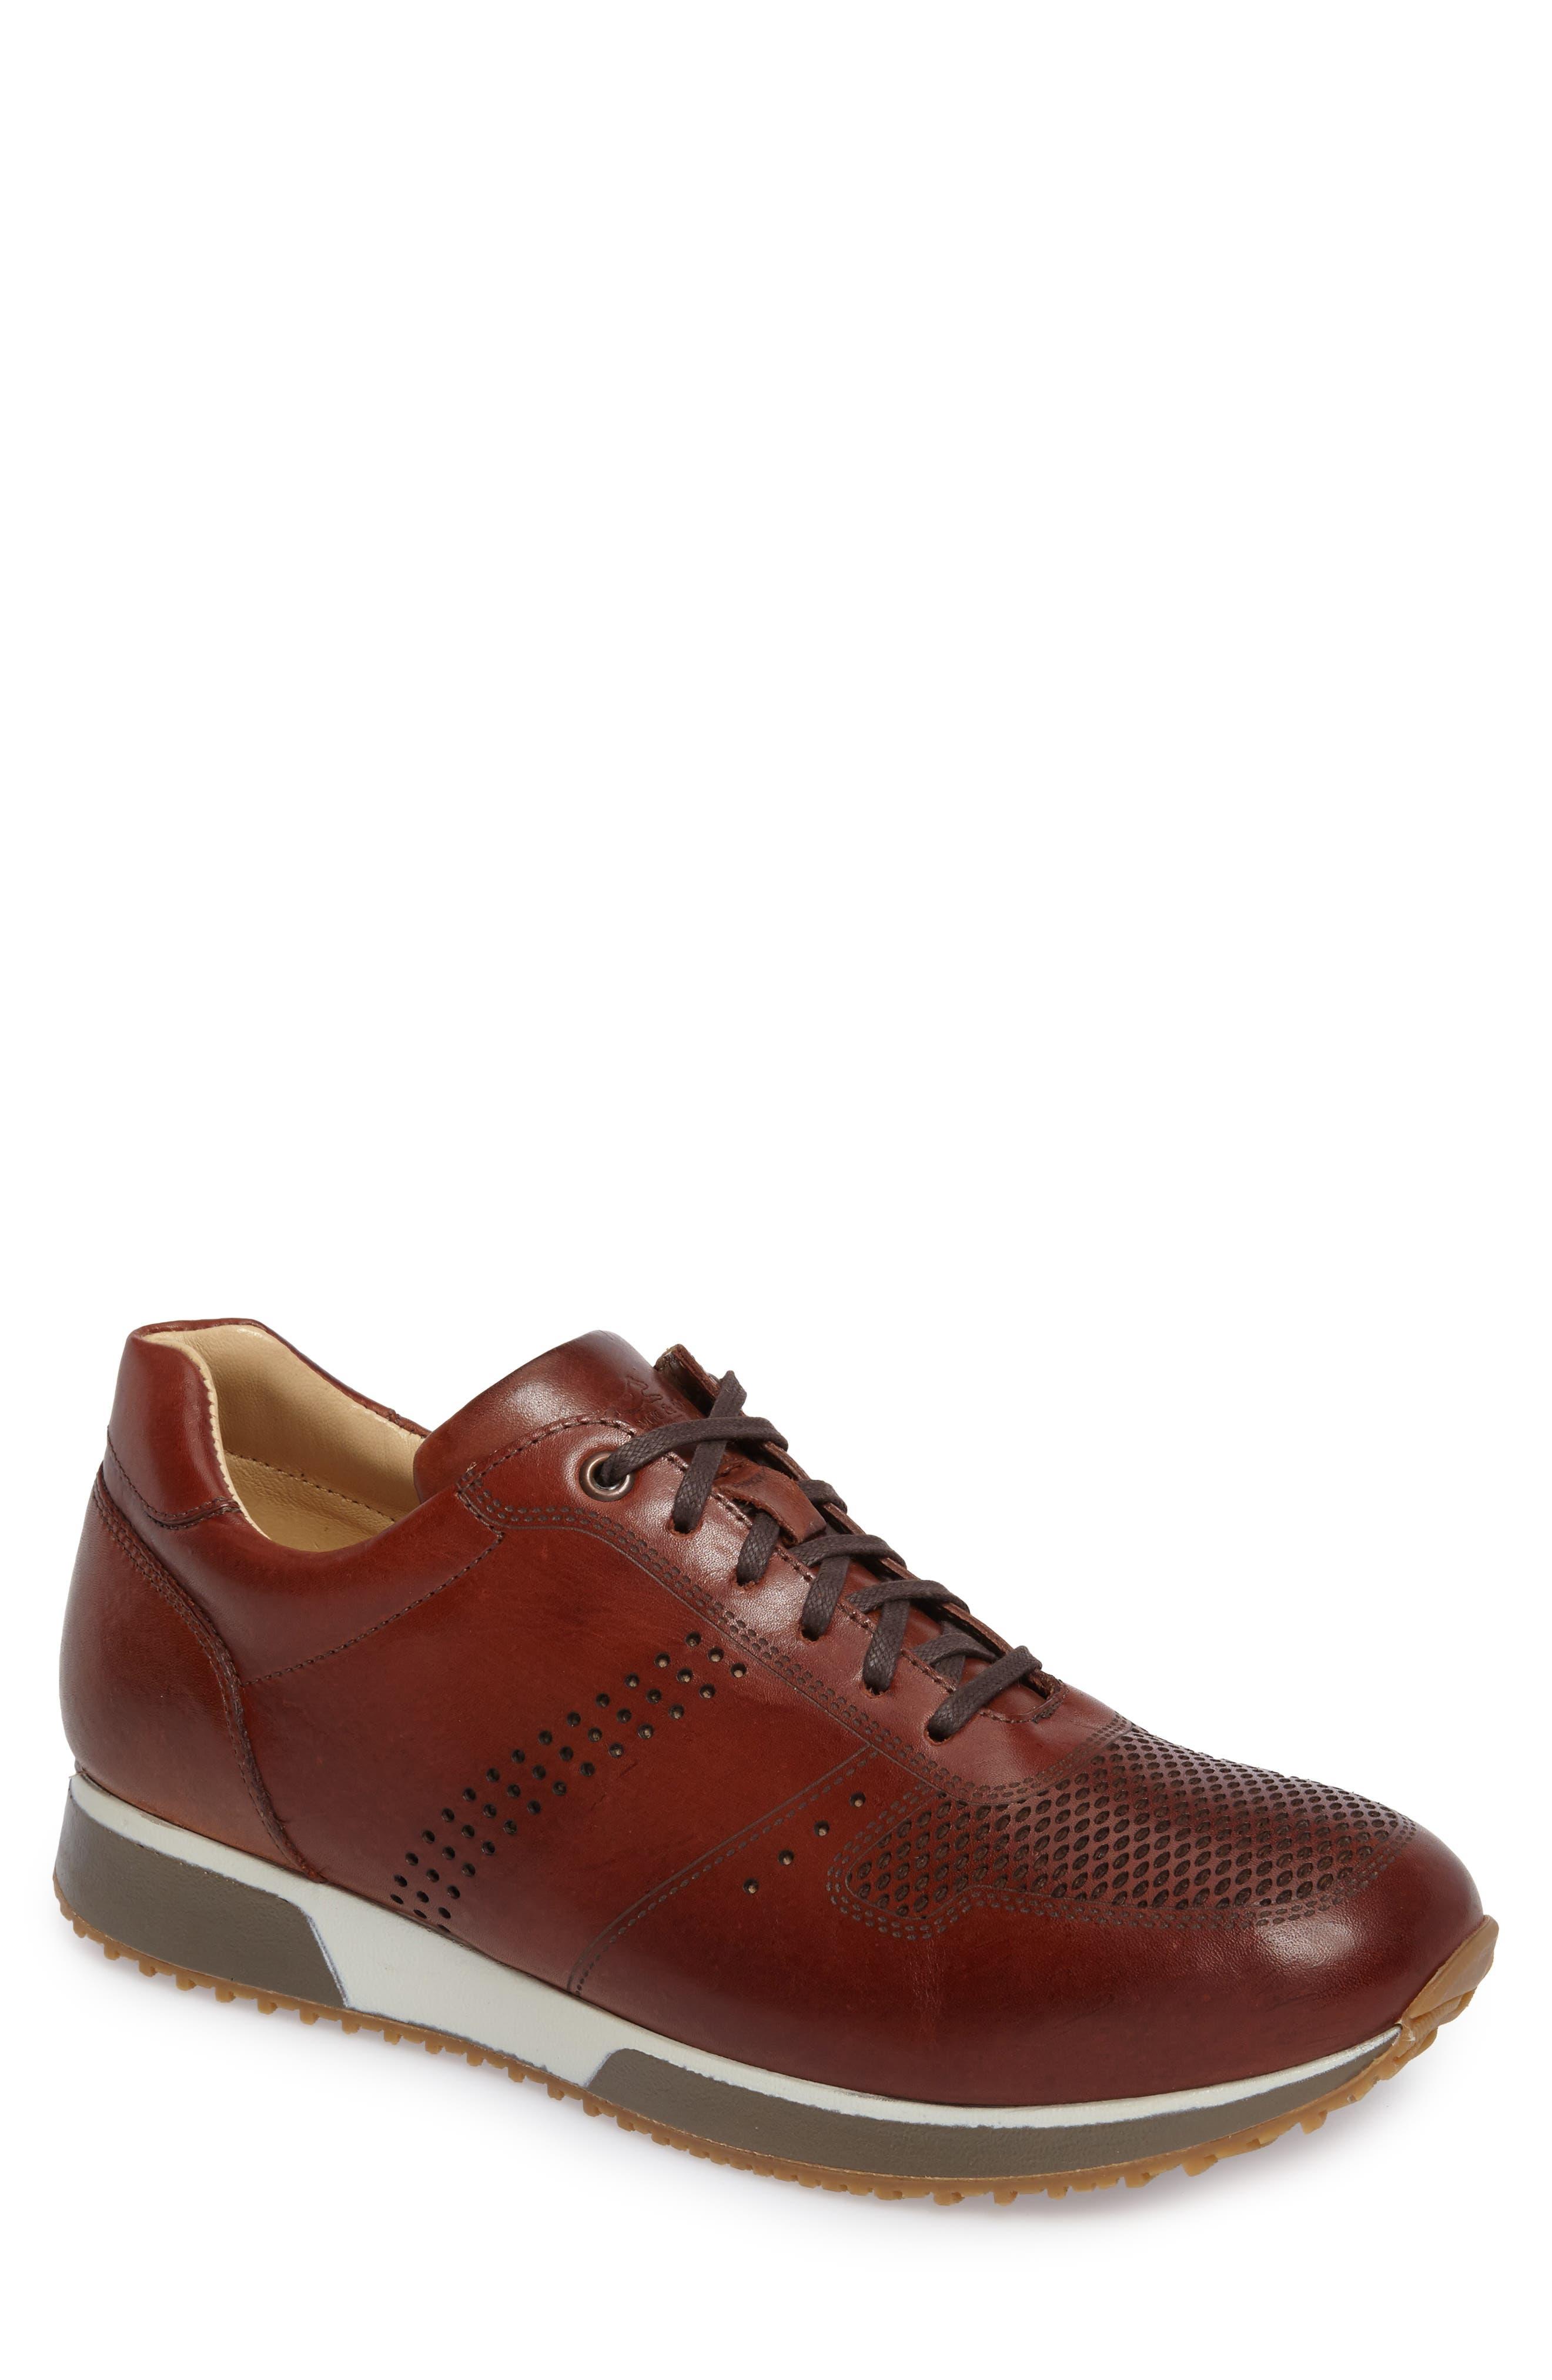 Classico Sneaker,                             Main thumbnail 1, color,                             200